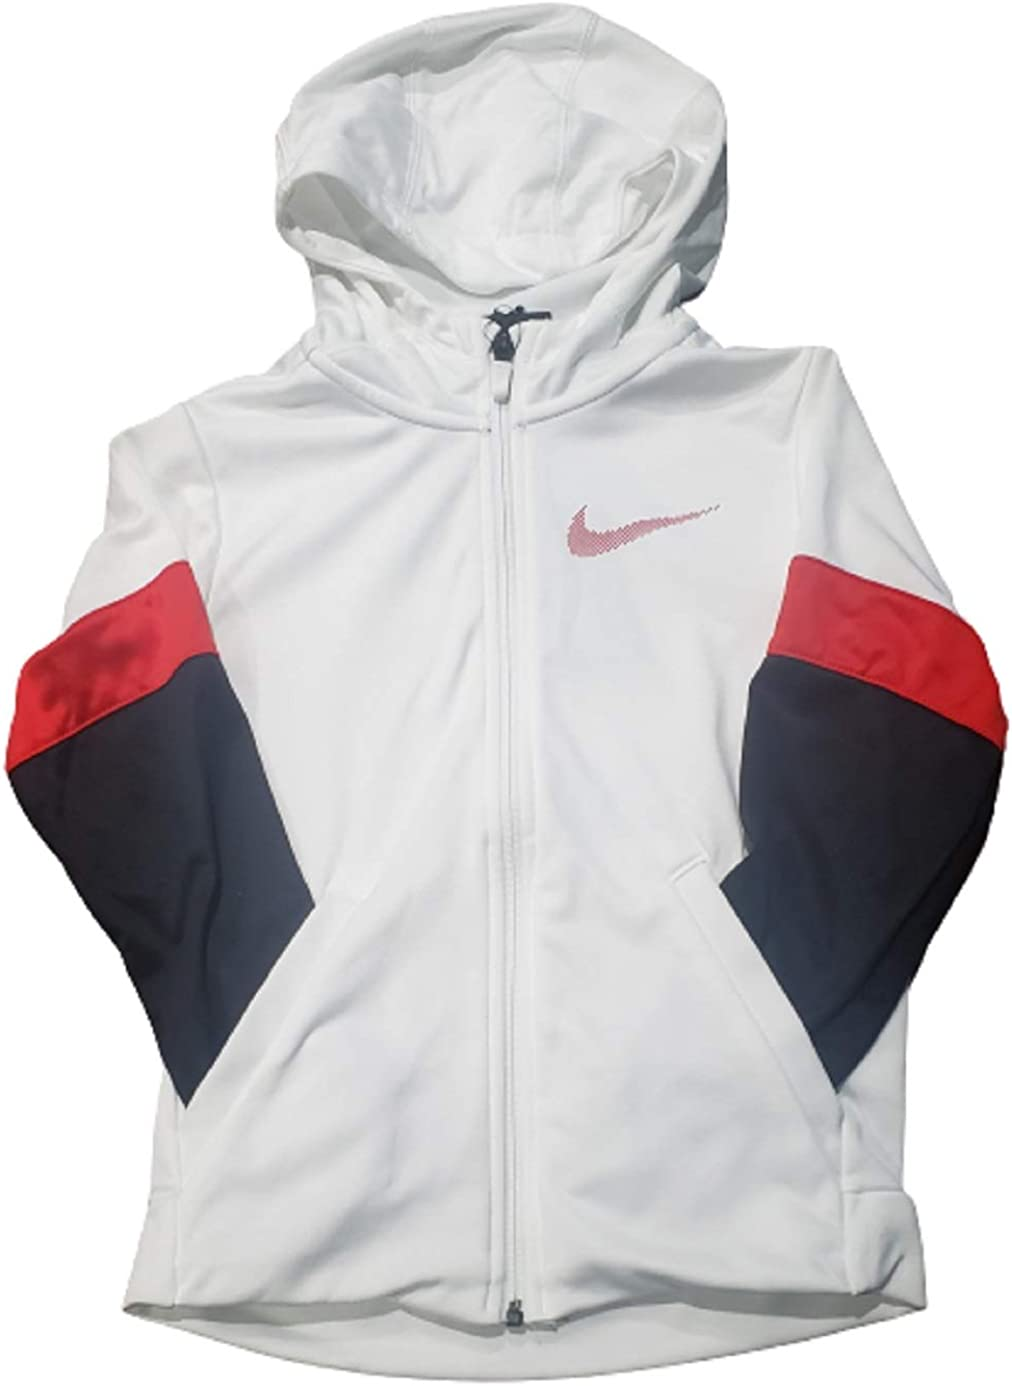 Nike Boy's Therma Dri-Fit Therma Full Zip Hoodie (S, White/Red/Black)